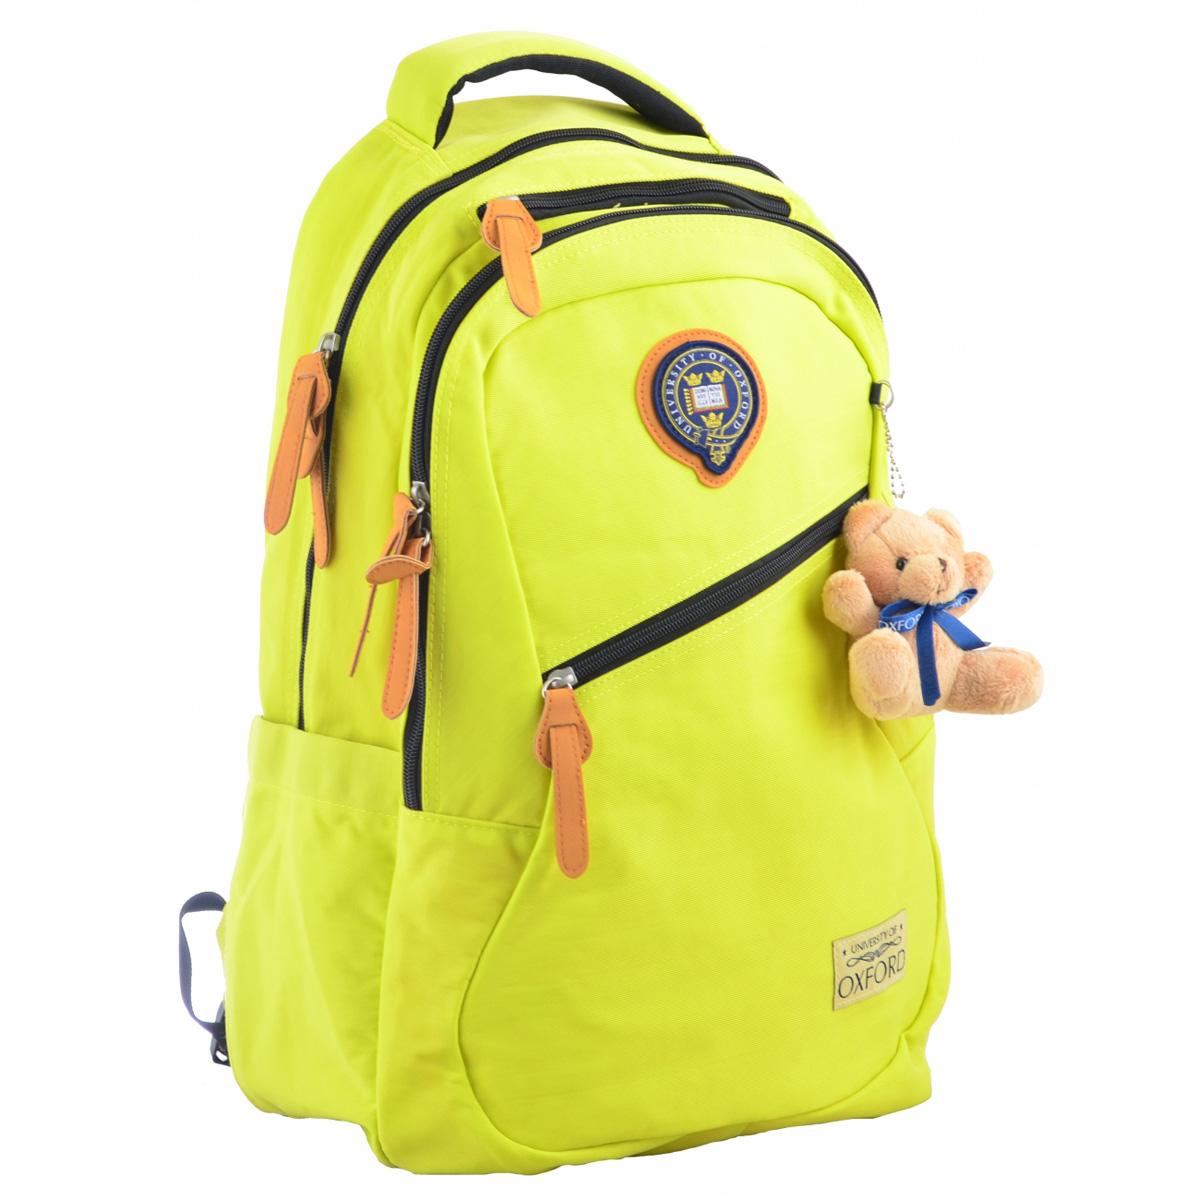 Рюкзак молодежный OX 405, 47*31*12.5, желтый